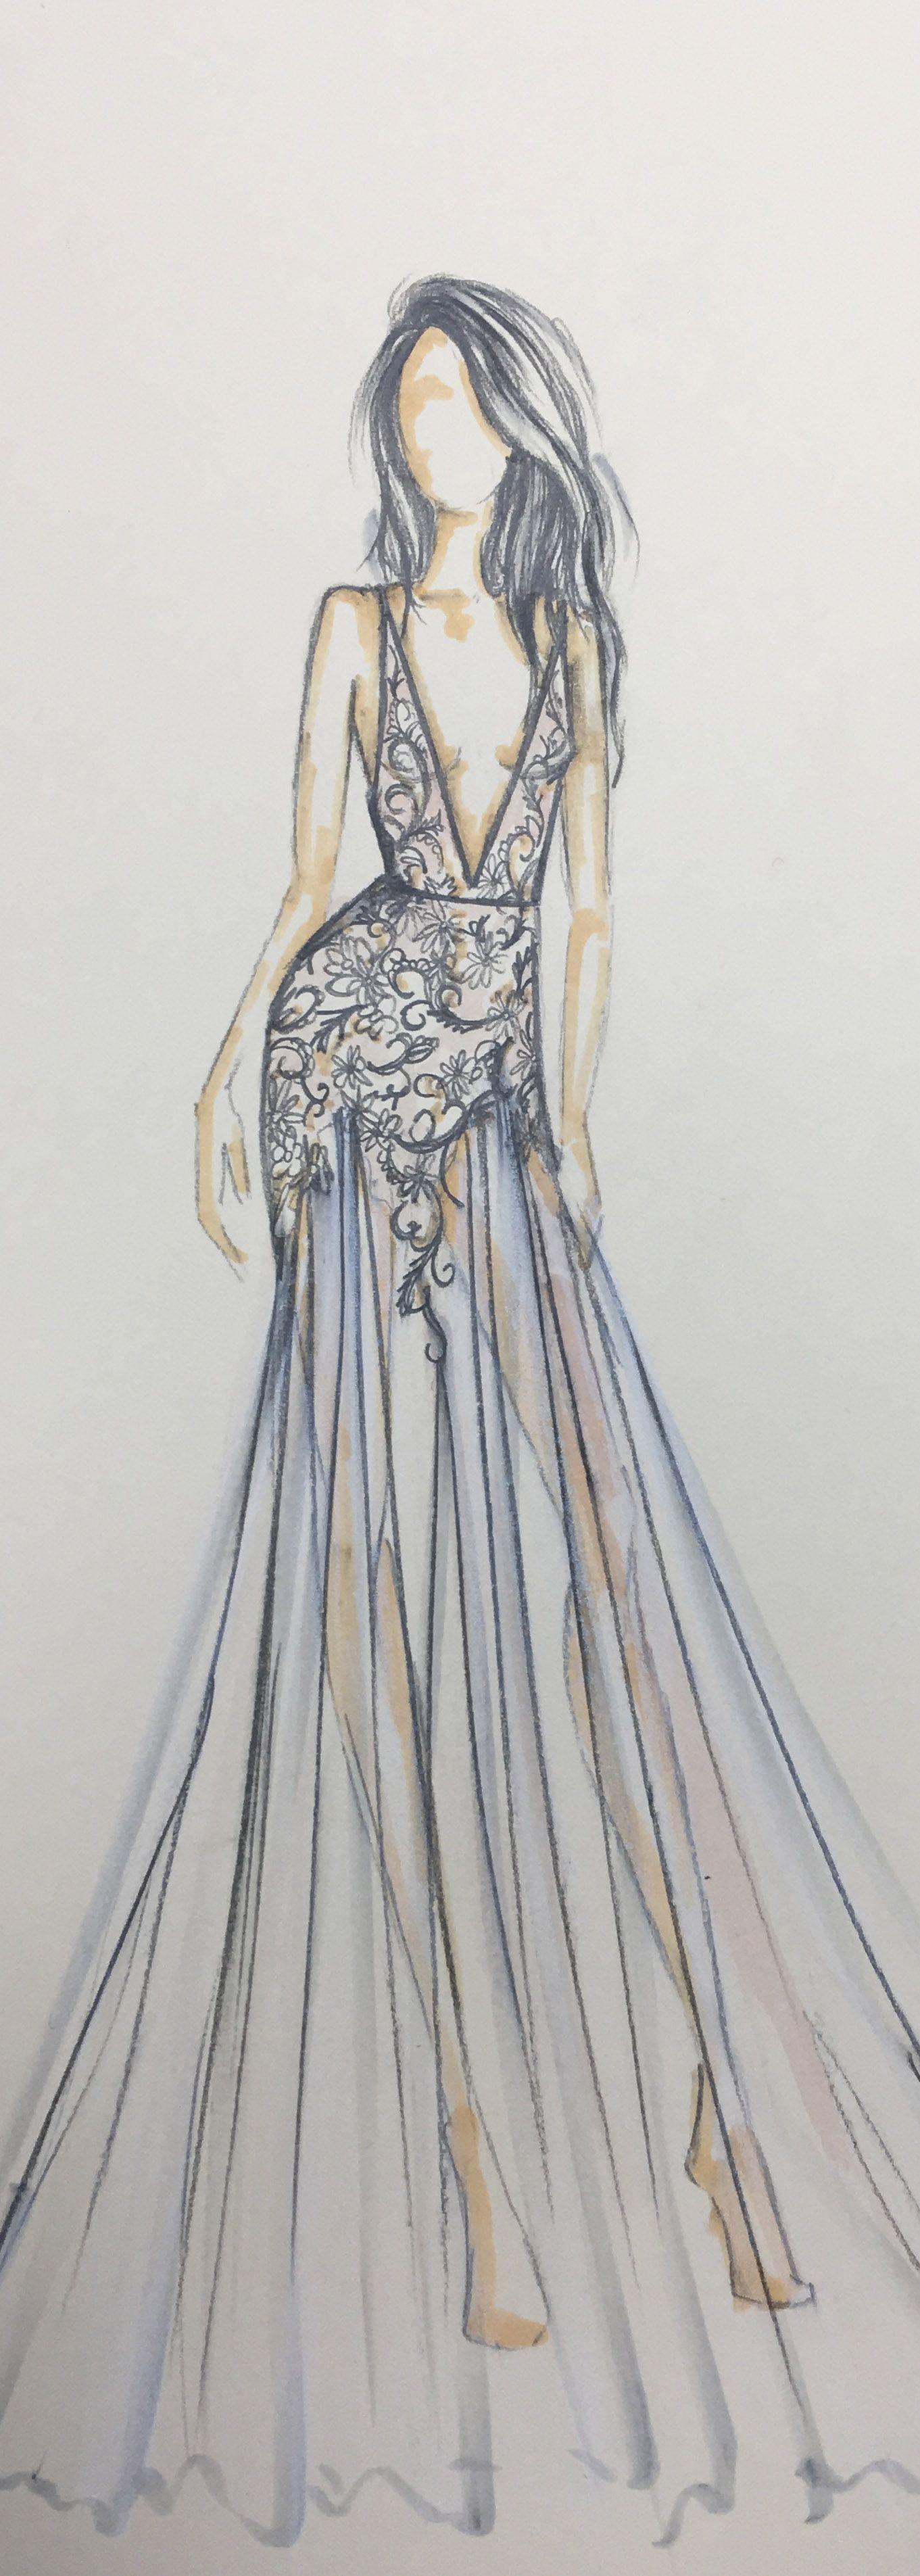 Berta 2017 Sketch Style 17 136